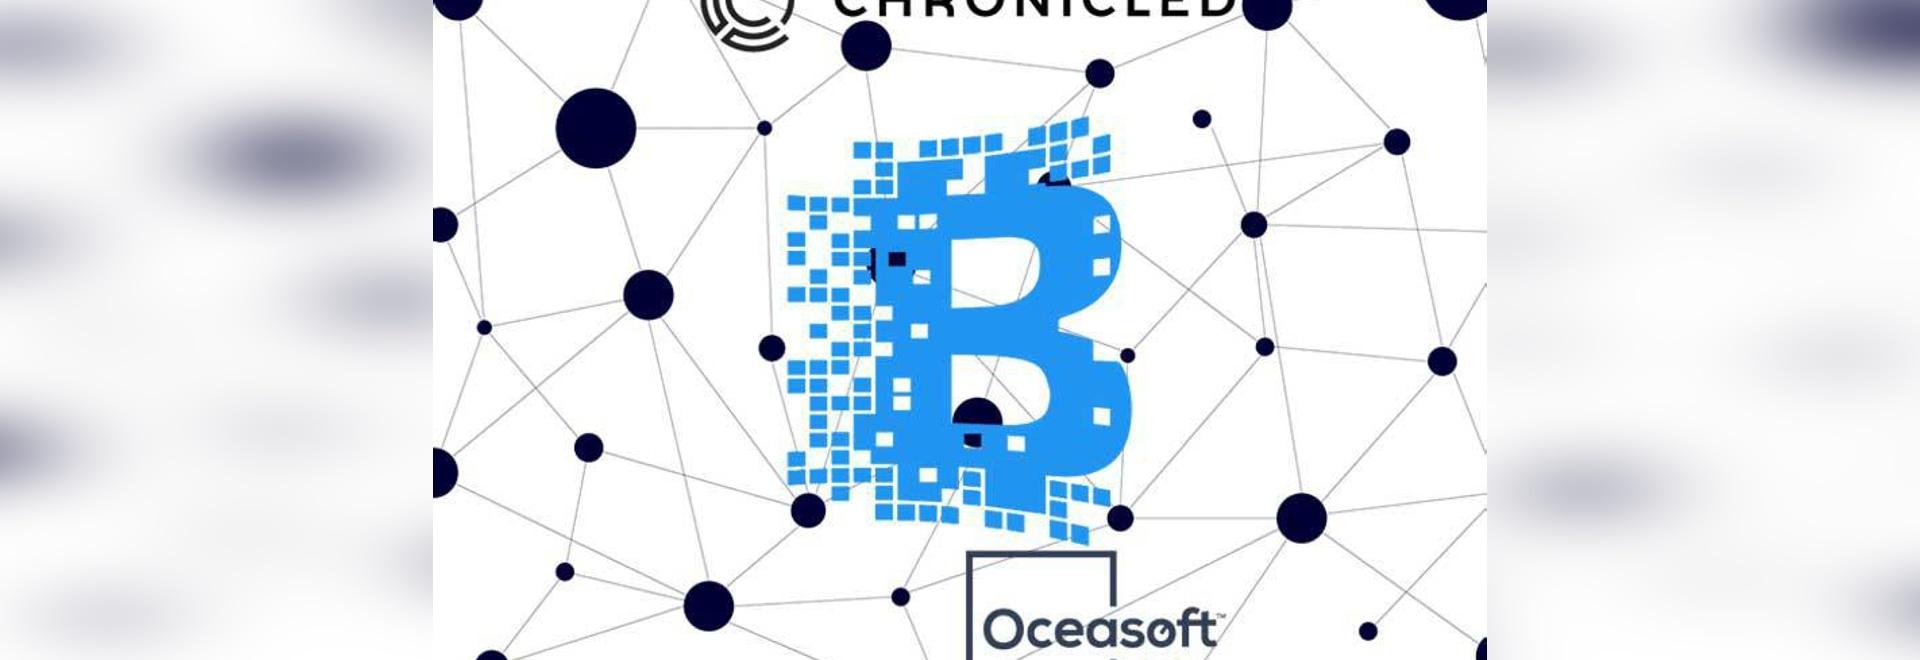 When Blockchain meets Cold Chain